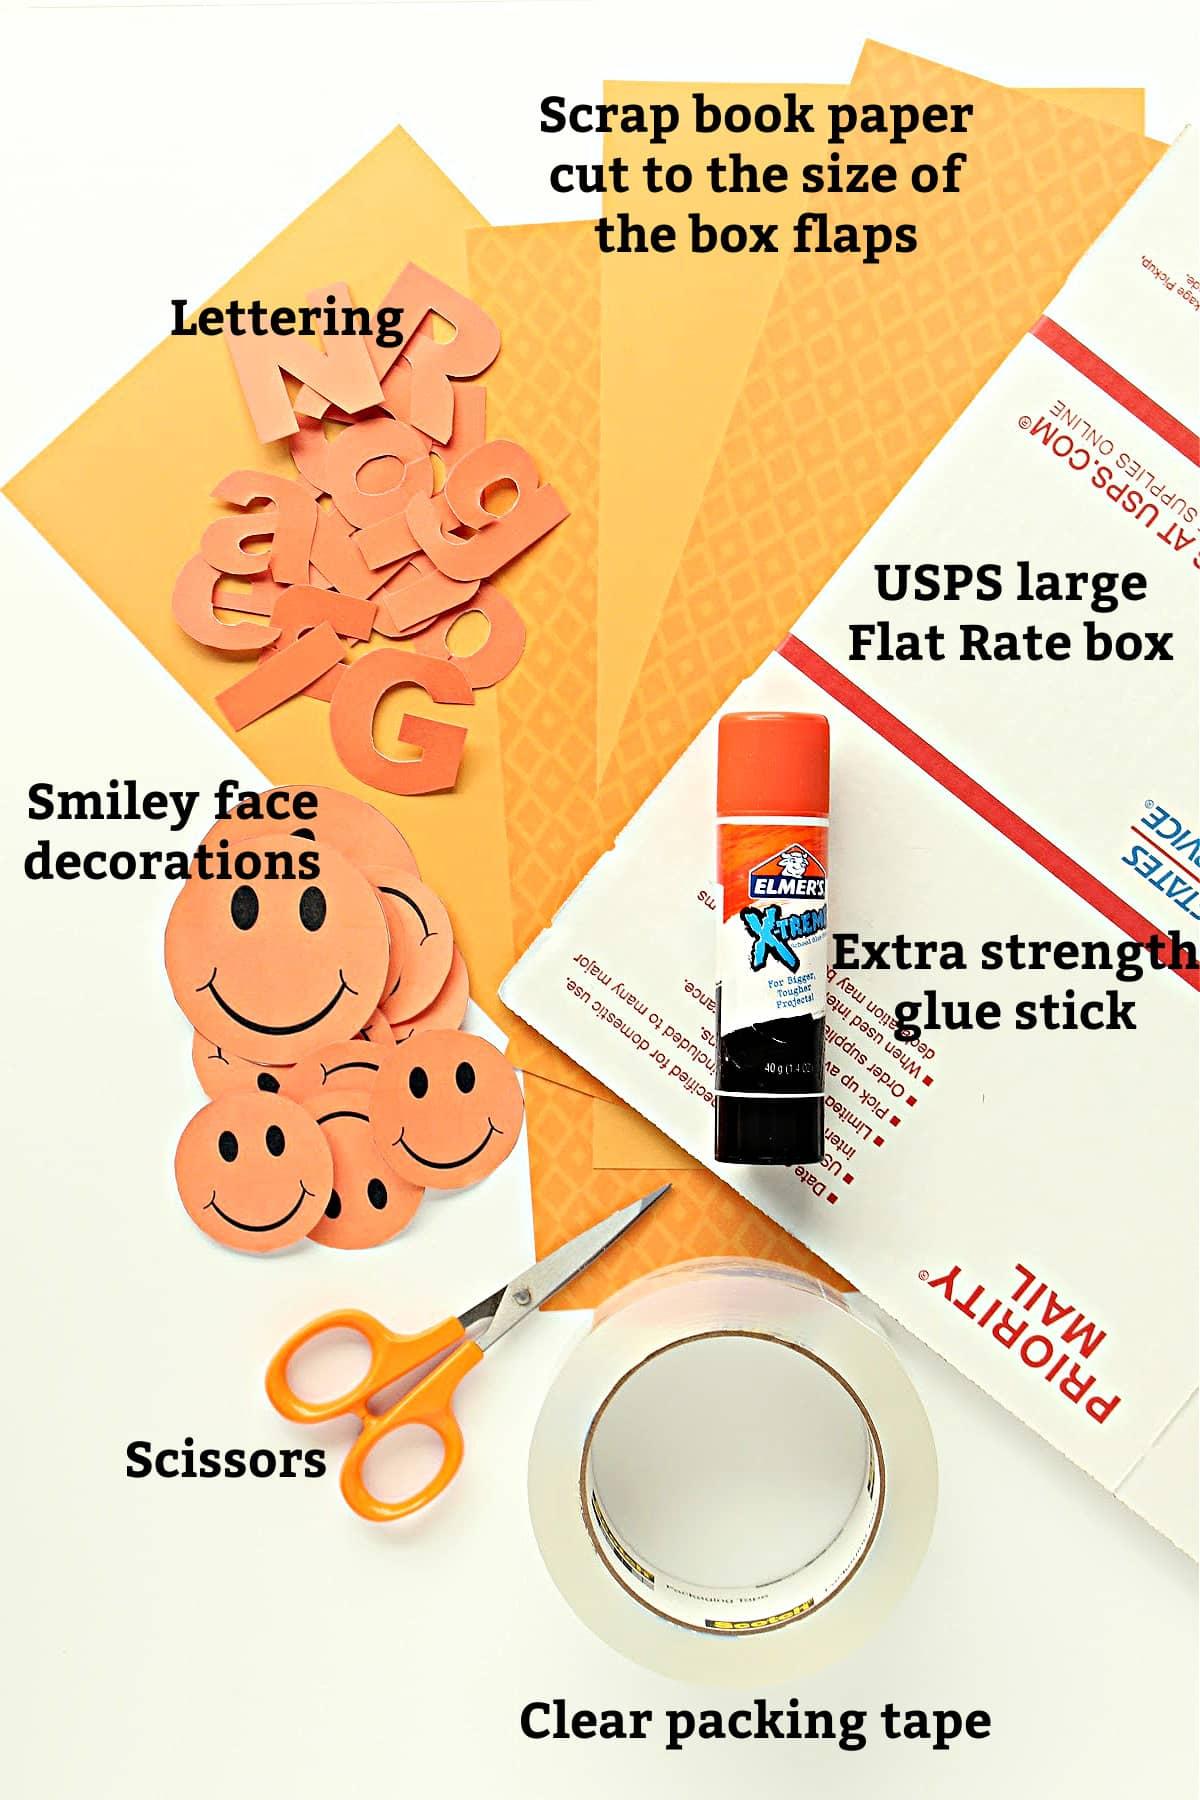 Box decorating supplies; box, glue stick, scissors, packing tape, orange paper, orange lettering, smiley decorations.